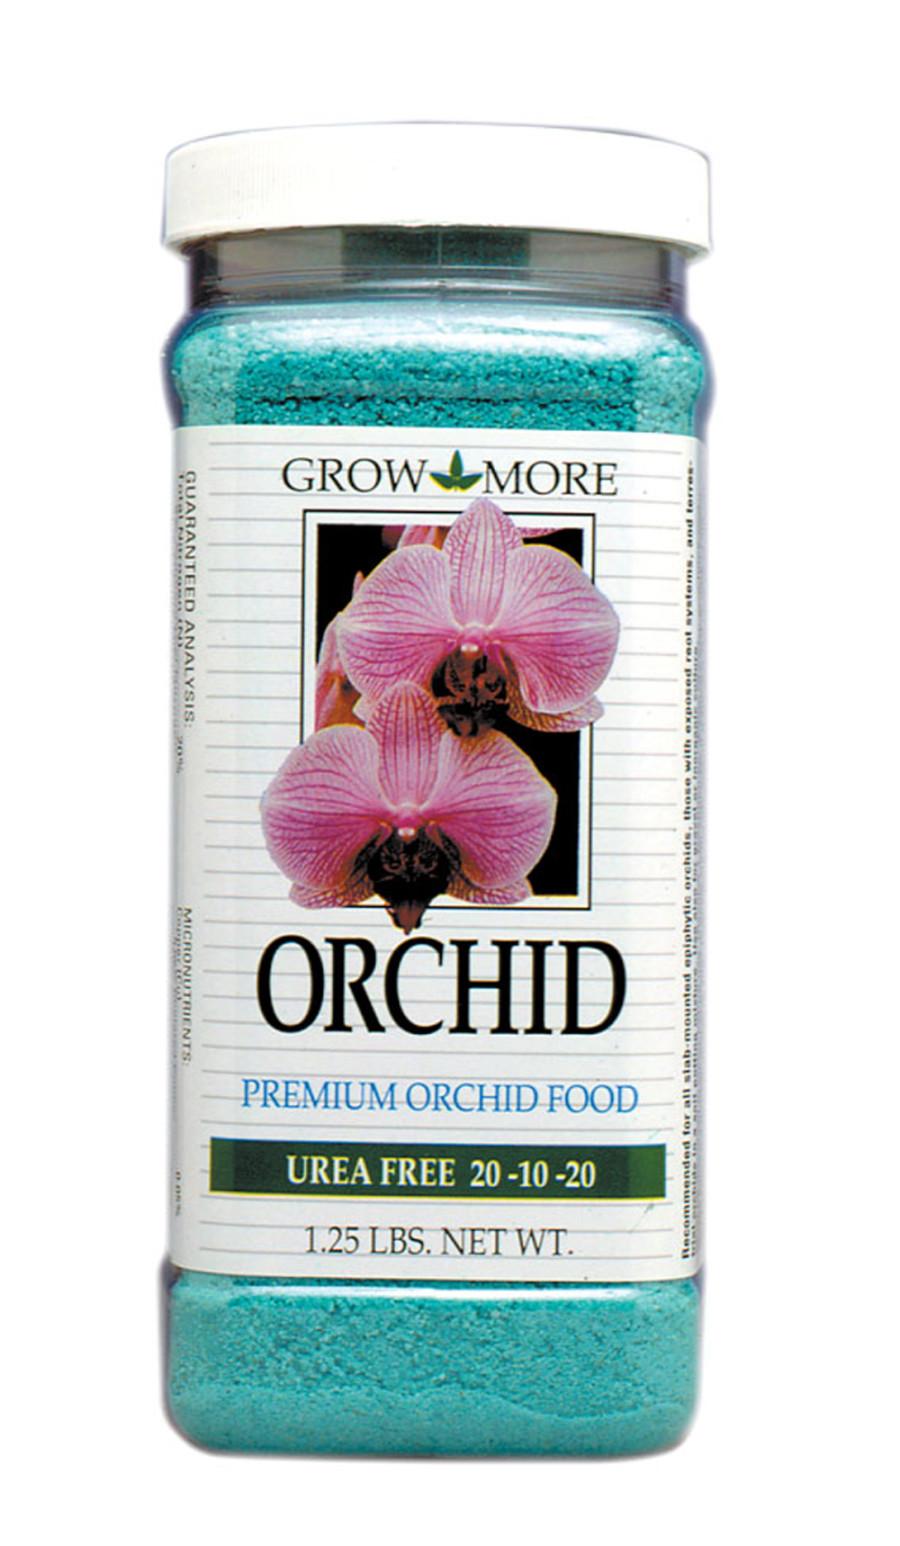 Grow More Orchid Food Urea Free Fertilizer 20-10-20